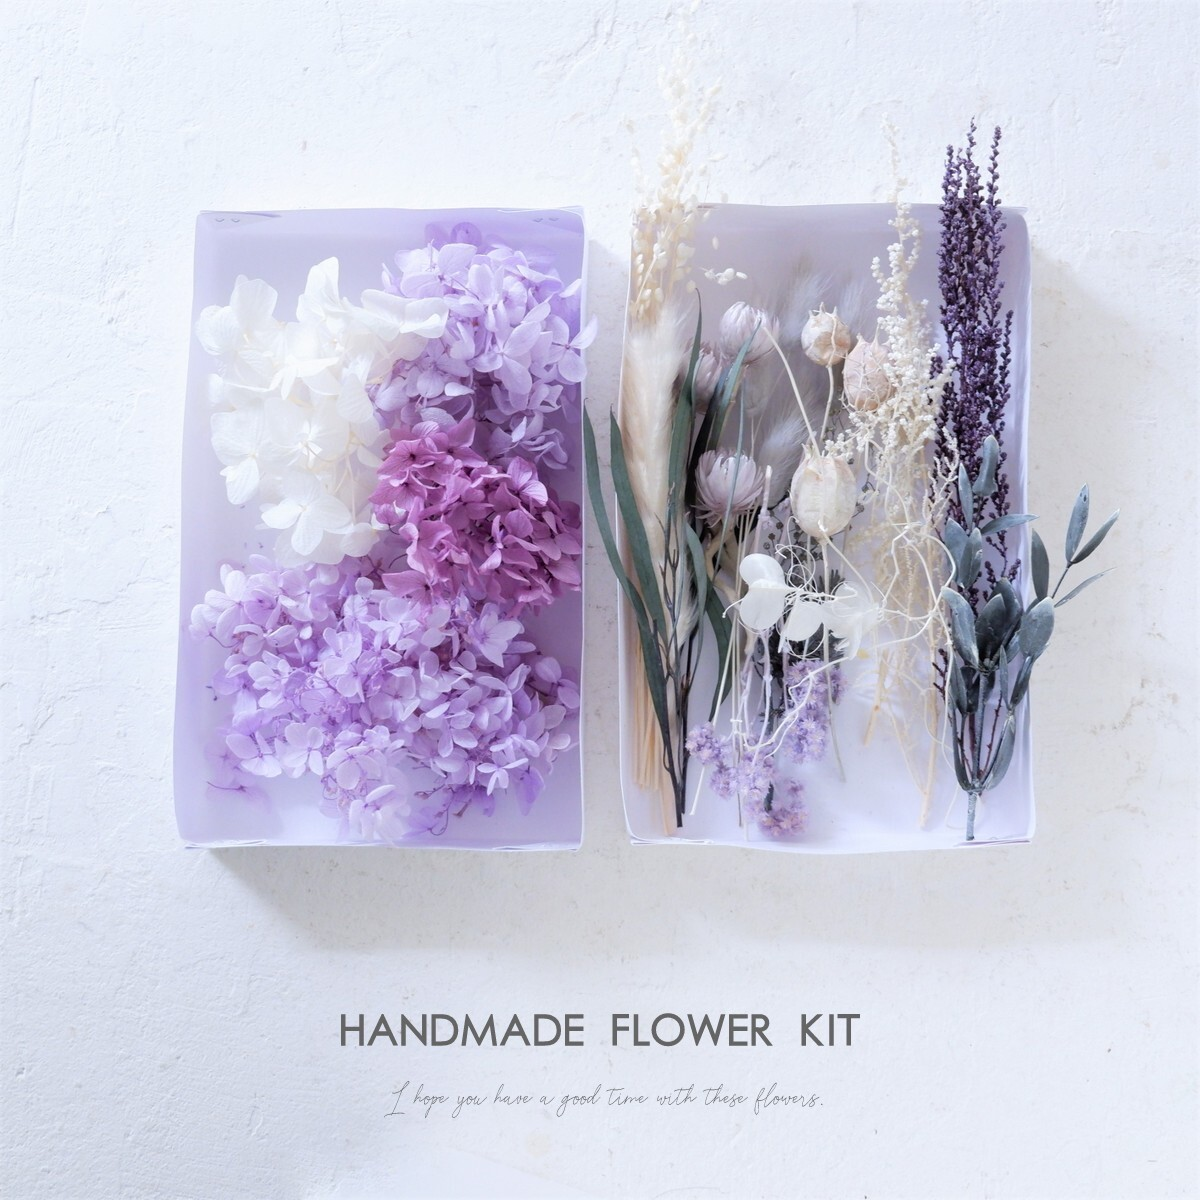 【 Handmade Flower kit・Sサイズ 】プリザーブドフラワー・ドライフラワーの手作りキット